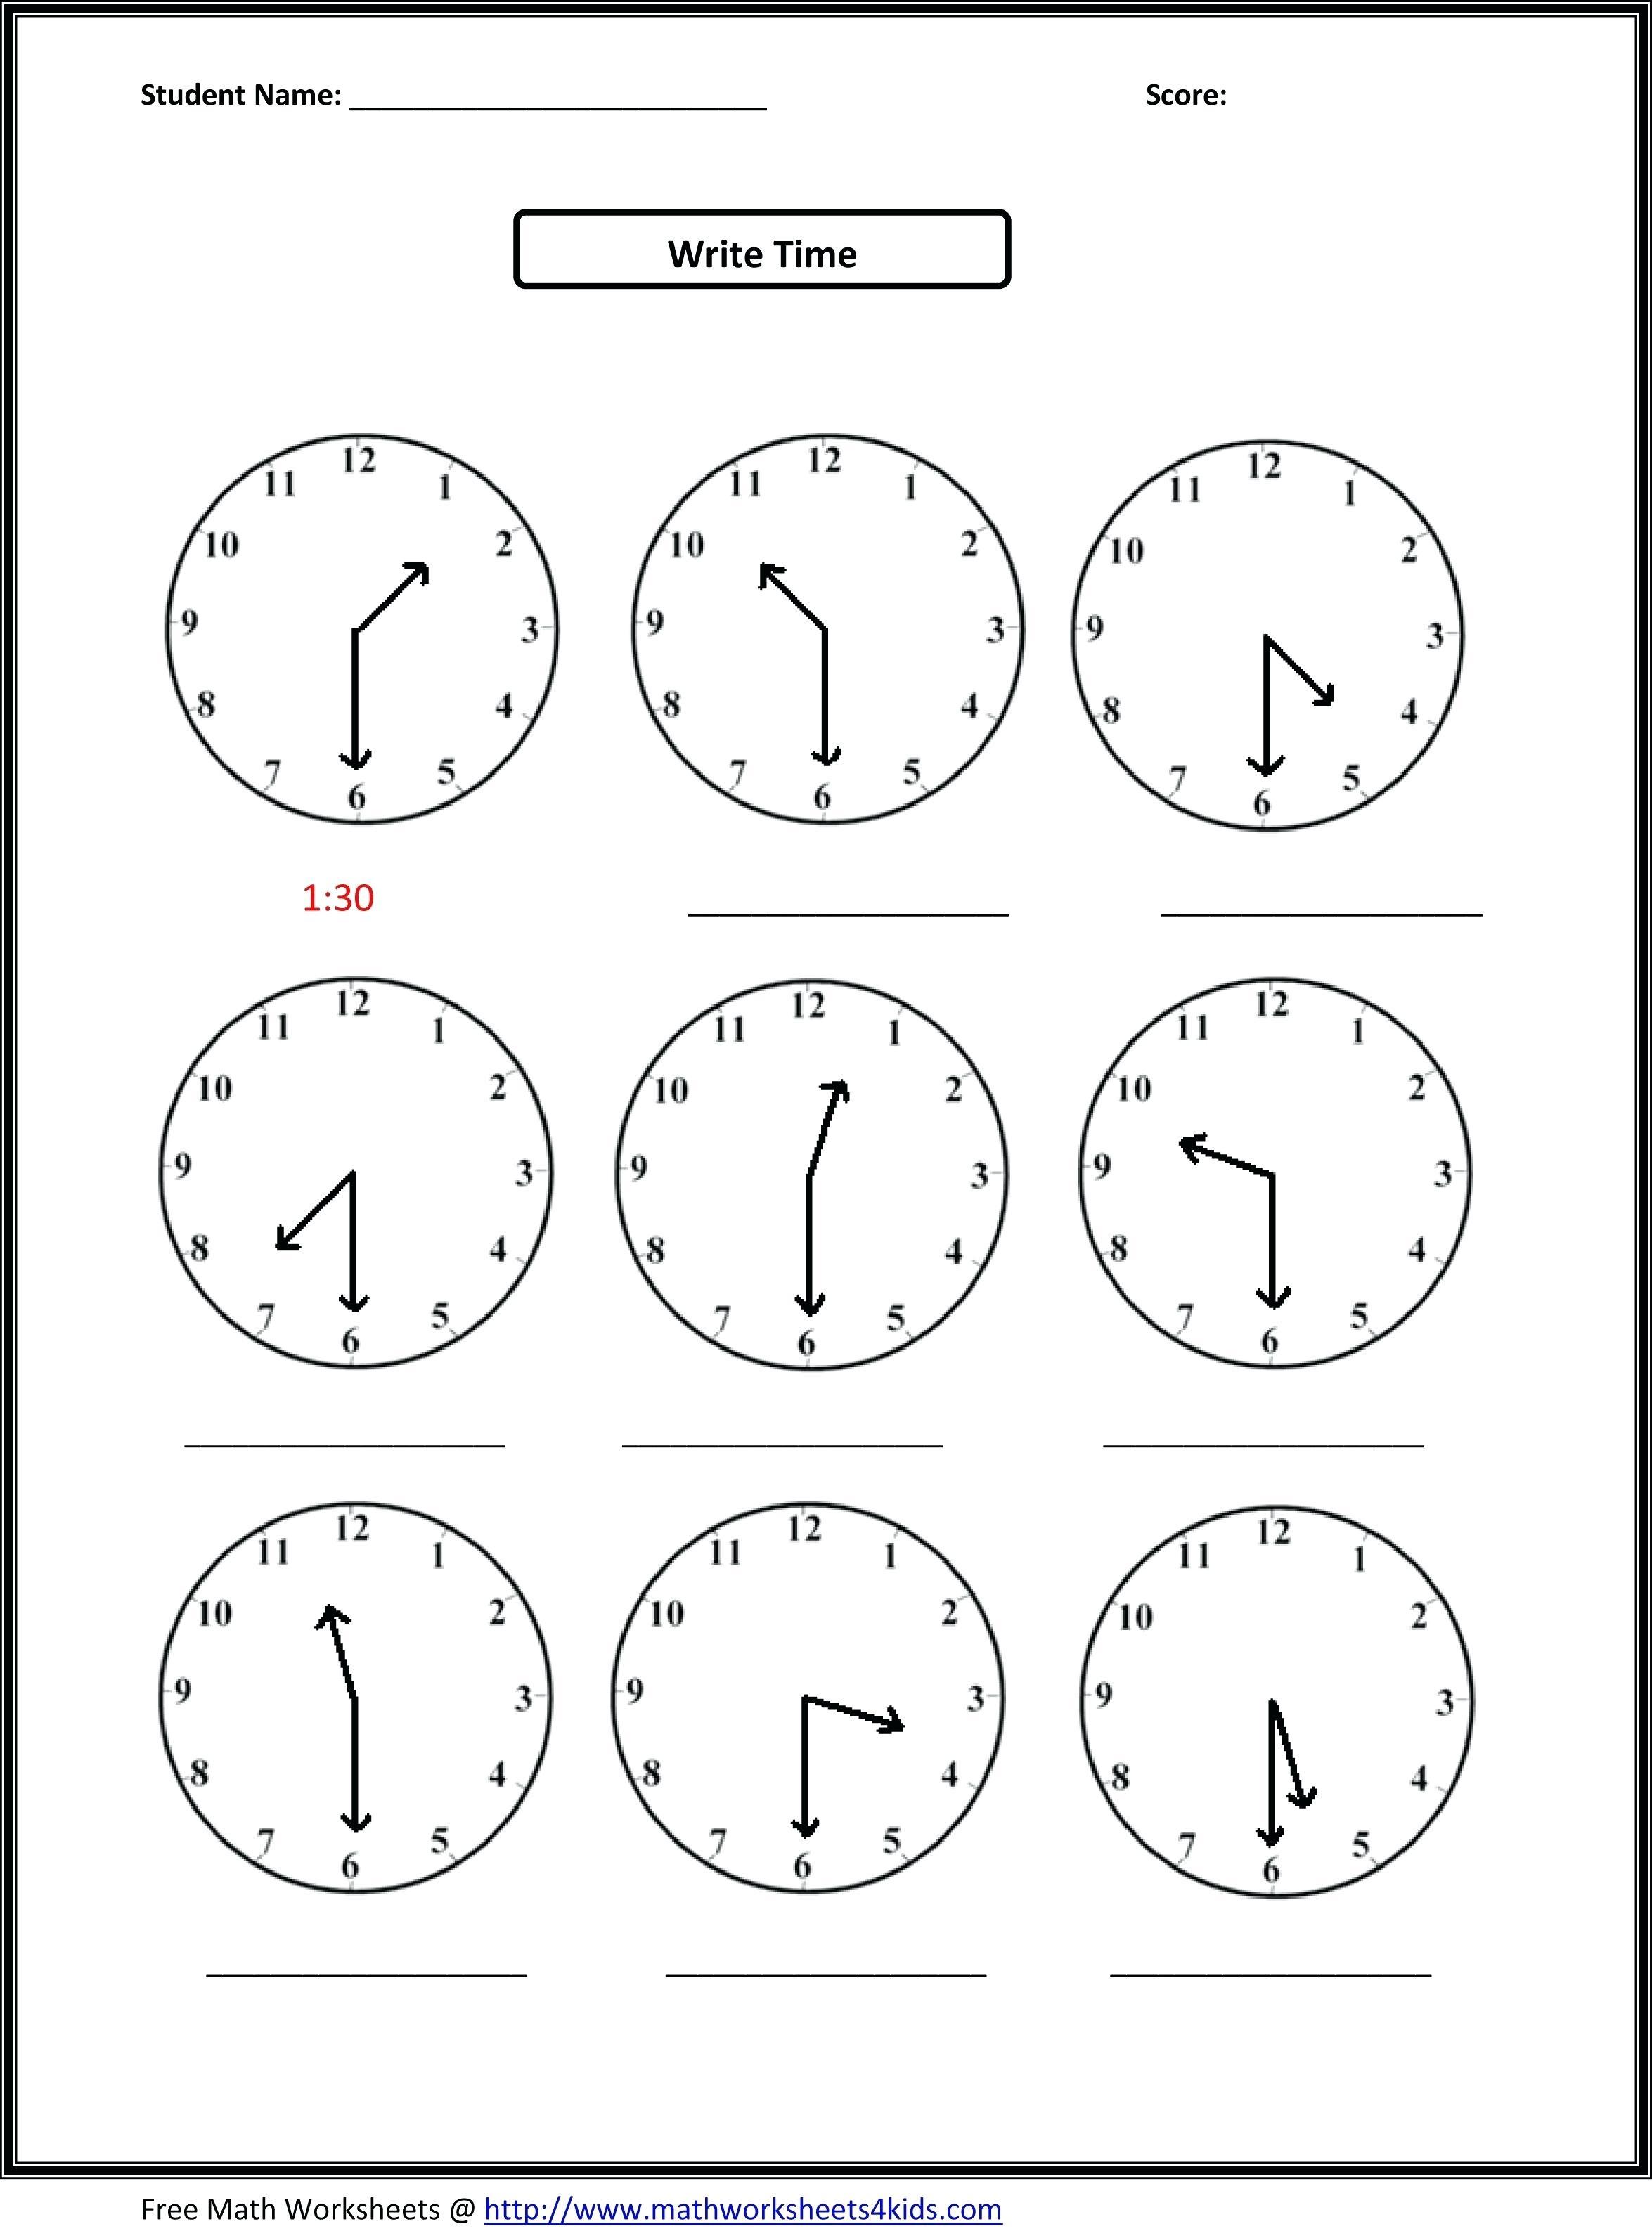 First Grade Time Worksheets First Grade Telling Time Worksheets And - Free Printable Telling Time Worksheets For 1St Grade